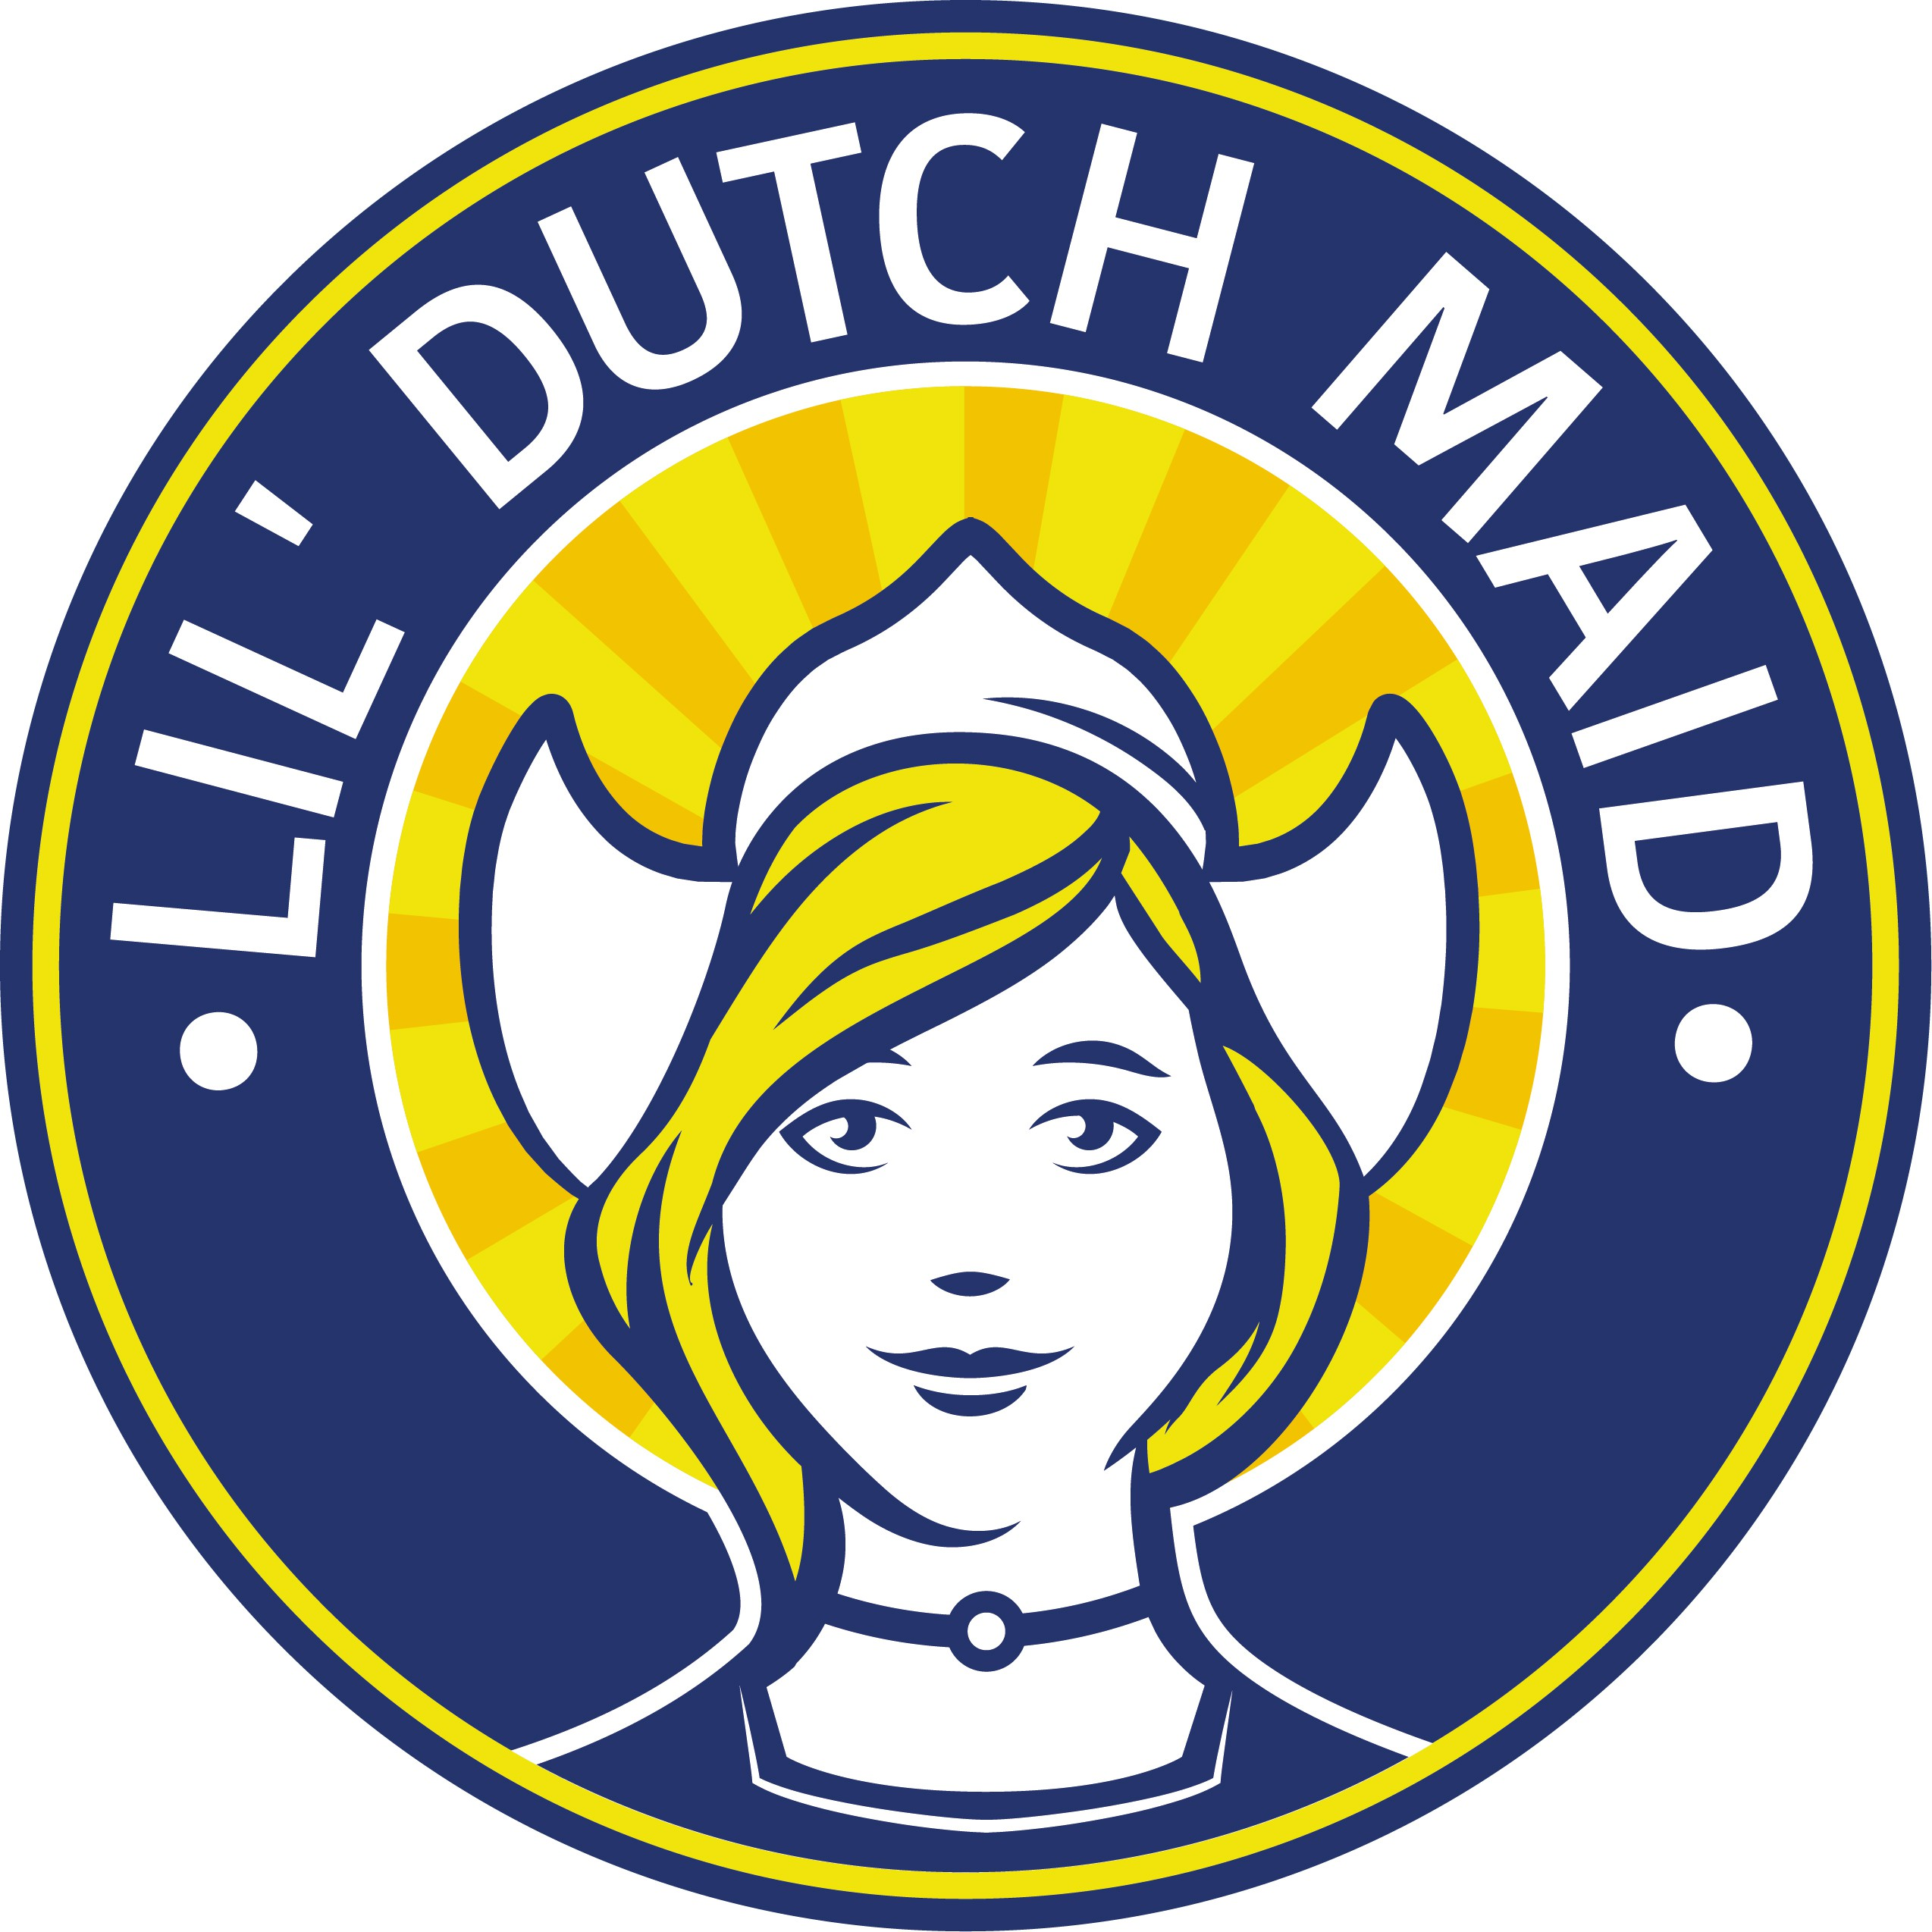 upgrade Lil 'Dutch Maid